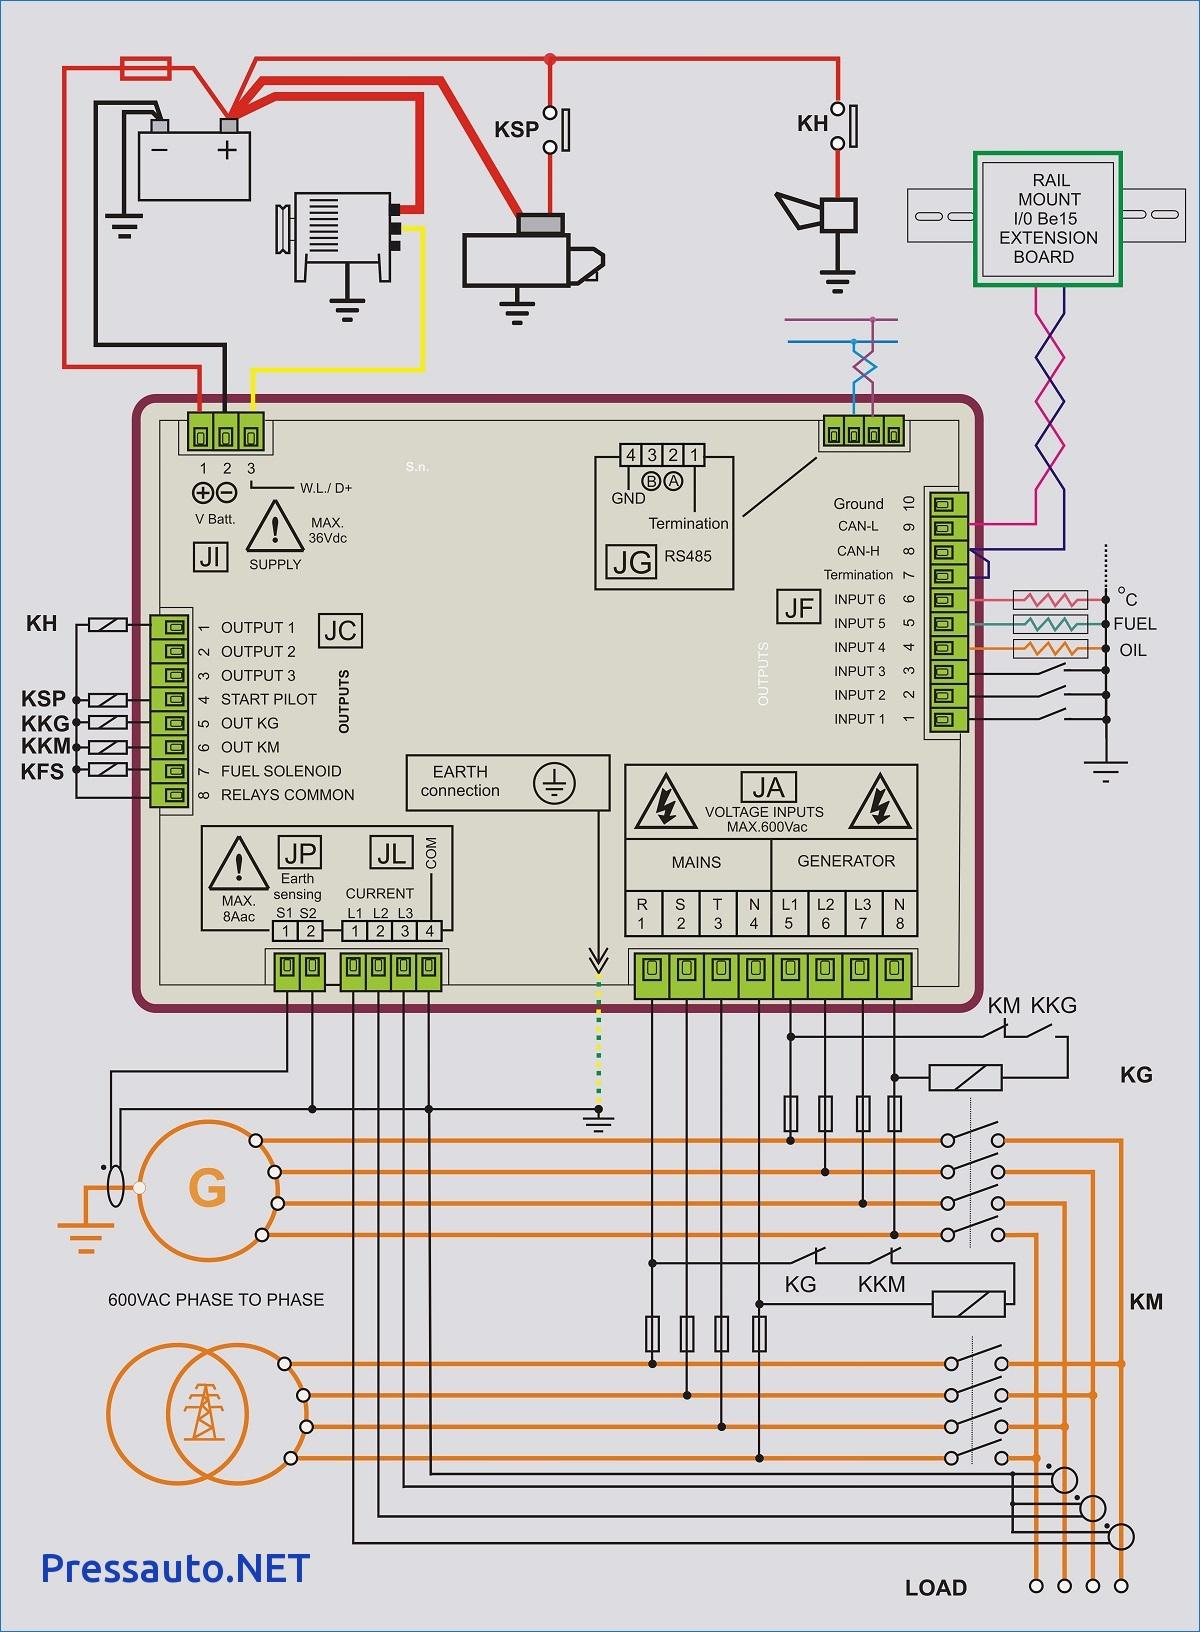 Generac Automatic Transfer Switch Wiring Diagram Download | Wiring - Generac Transfer Switch Wiring Diagram